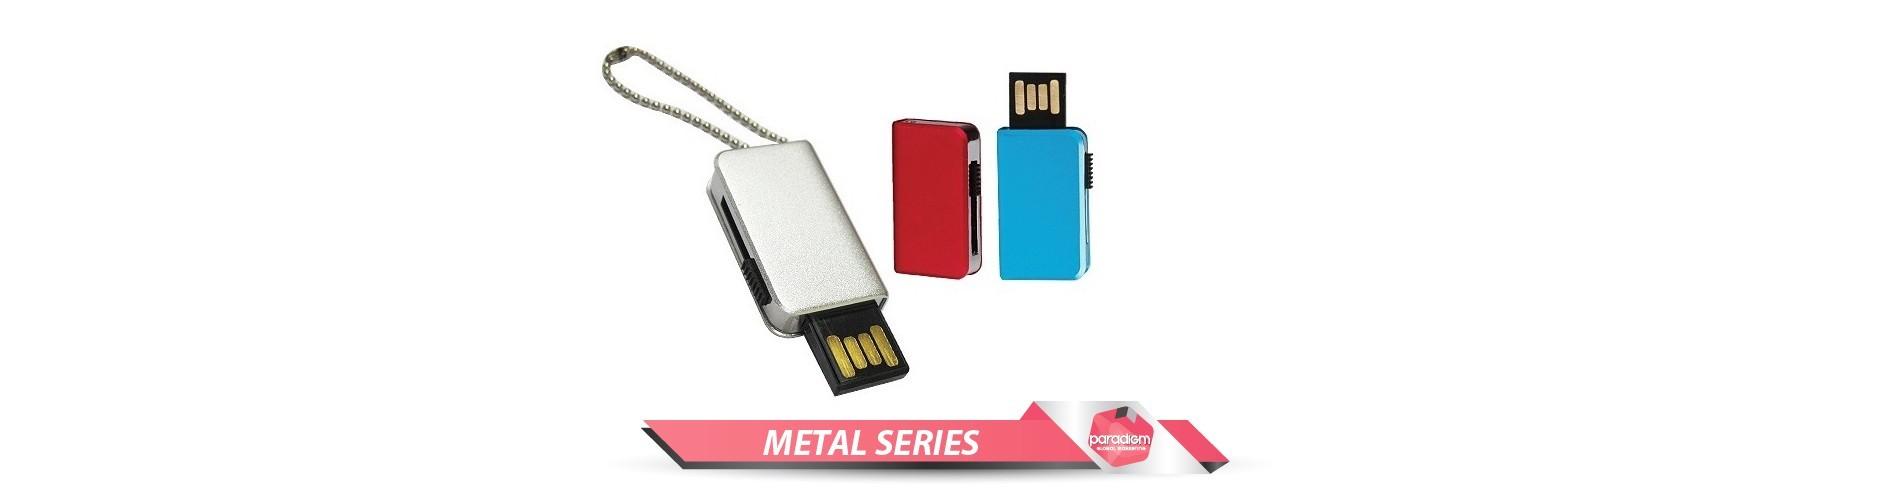 Metal series USB